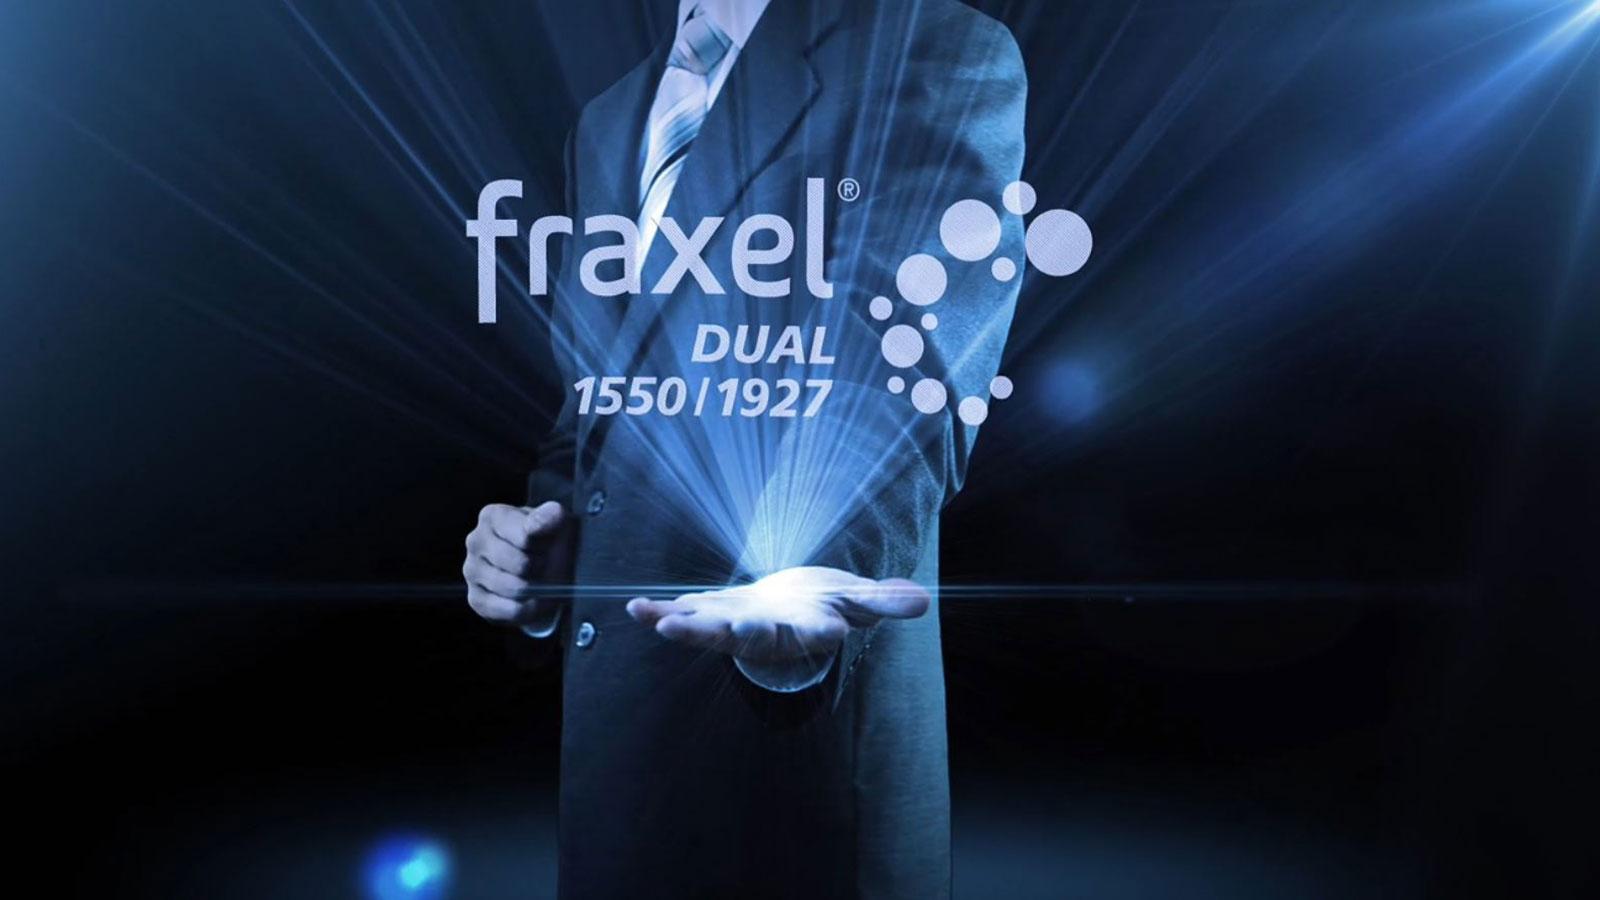 Fraxel Promo